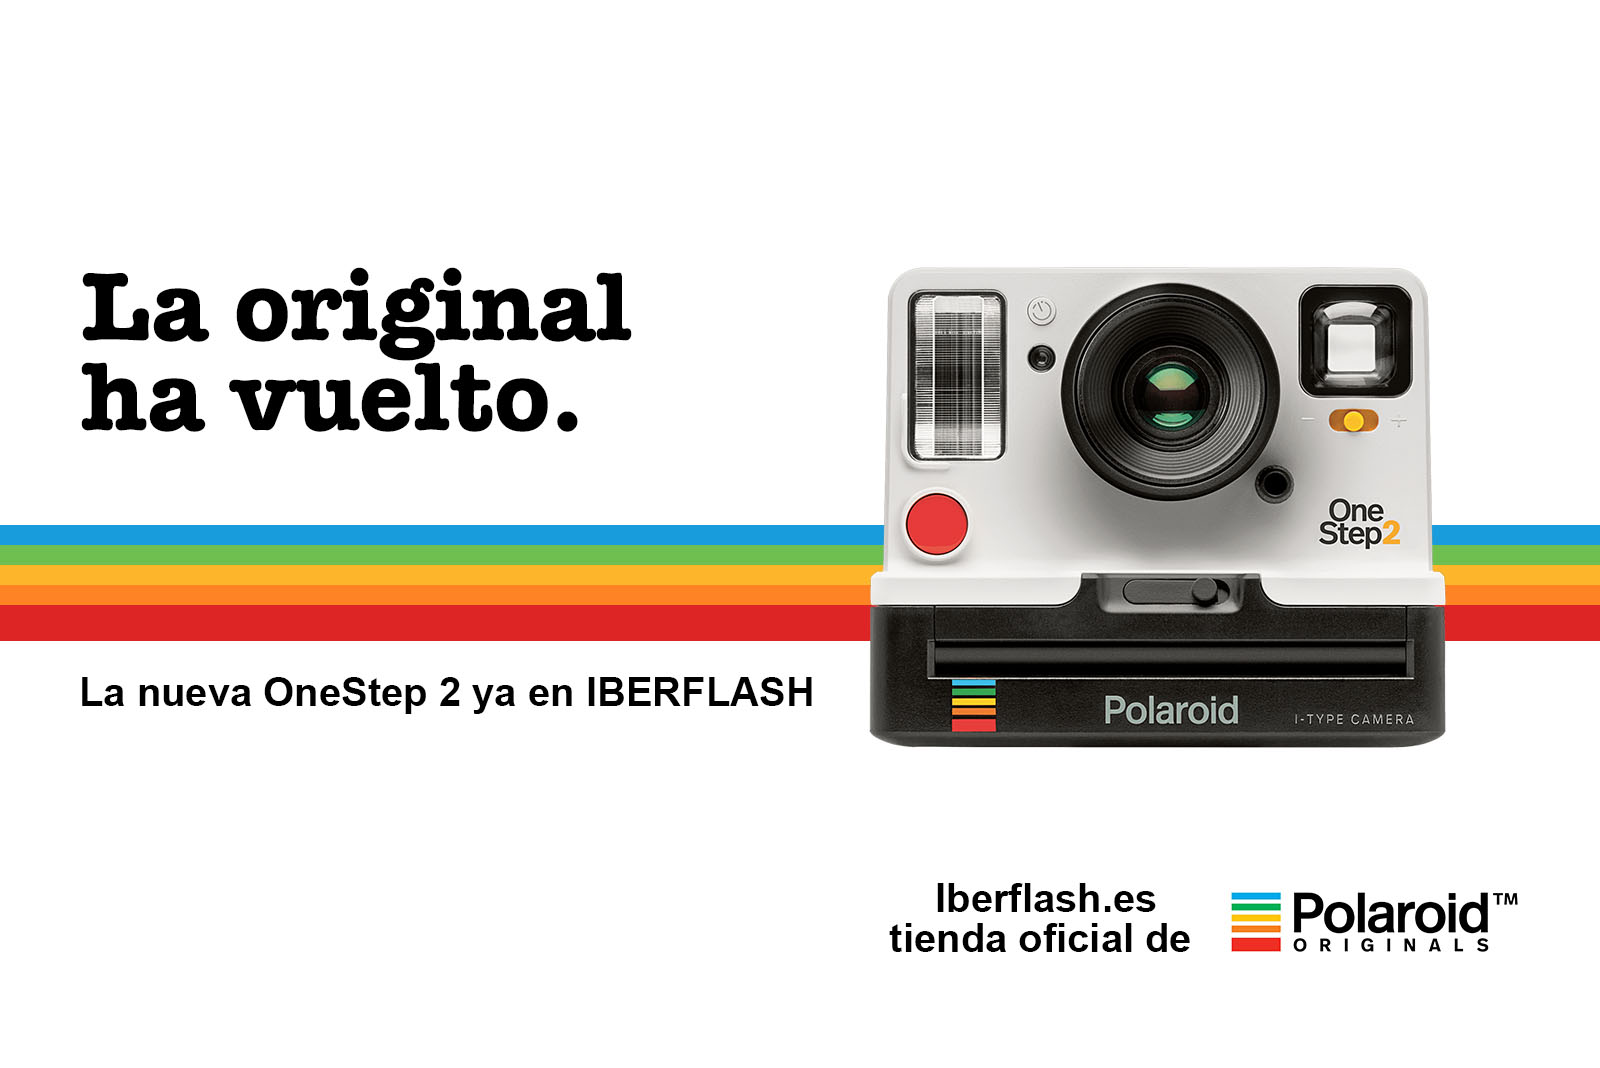 b1859c2f50 Tienda Oficial de Polaroid Originals - Iberflash Fotografía